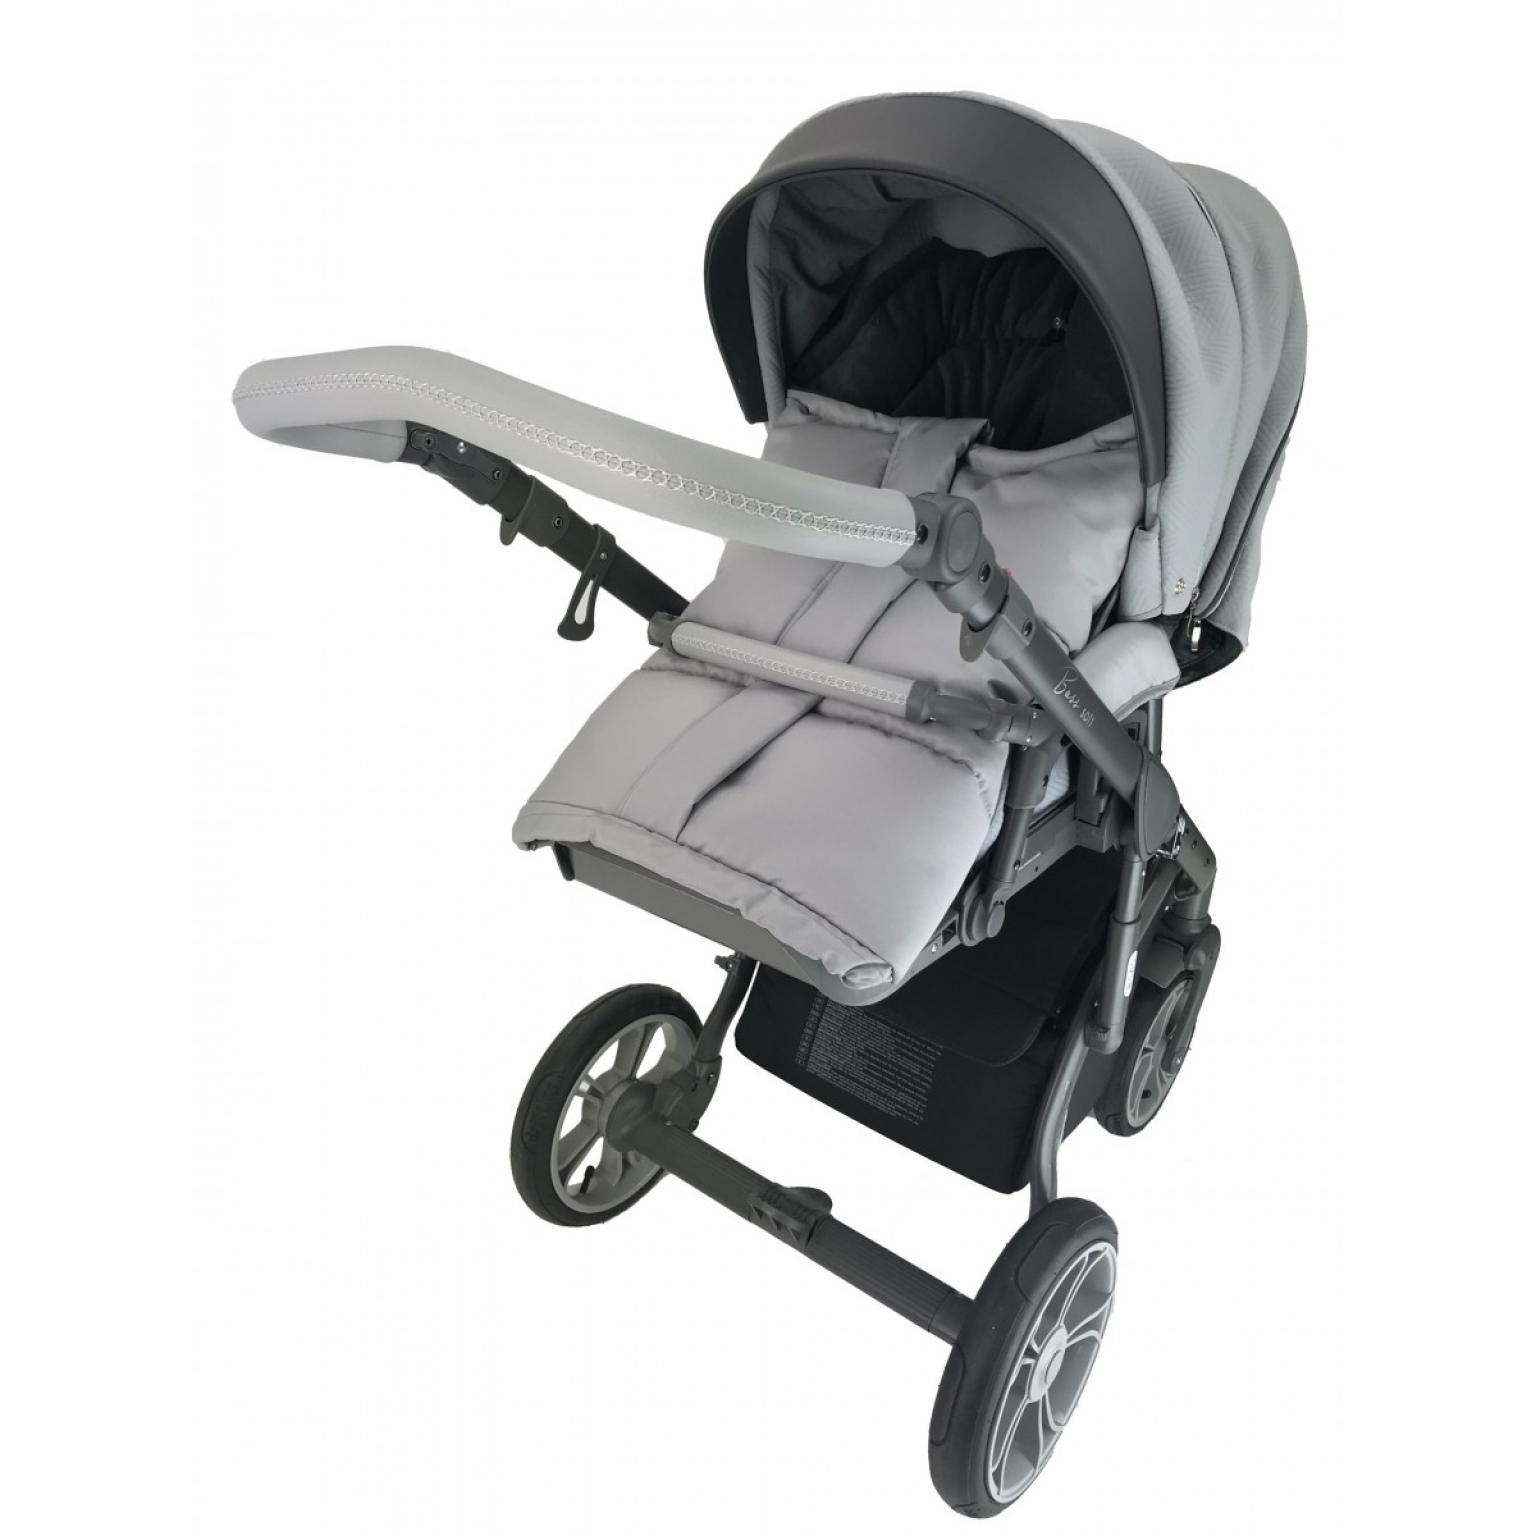 bērnu rati ROAN BASS SOFT Anthracite Grey, Детские коляски